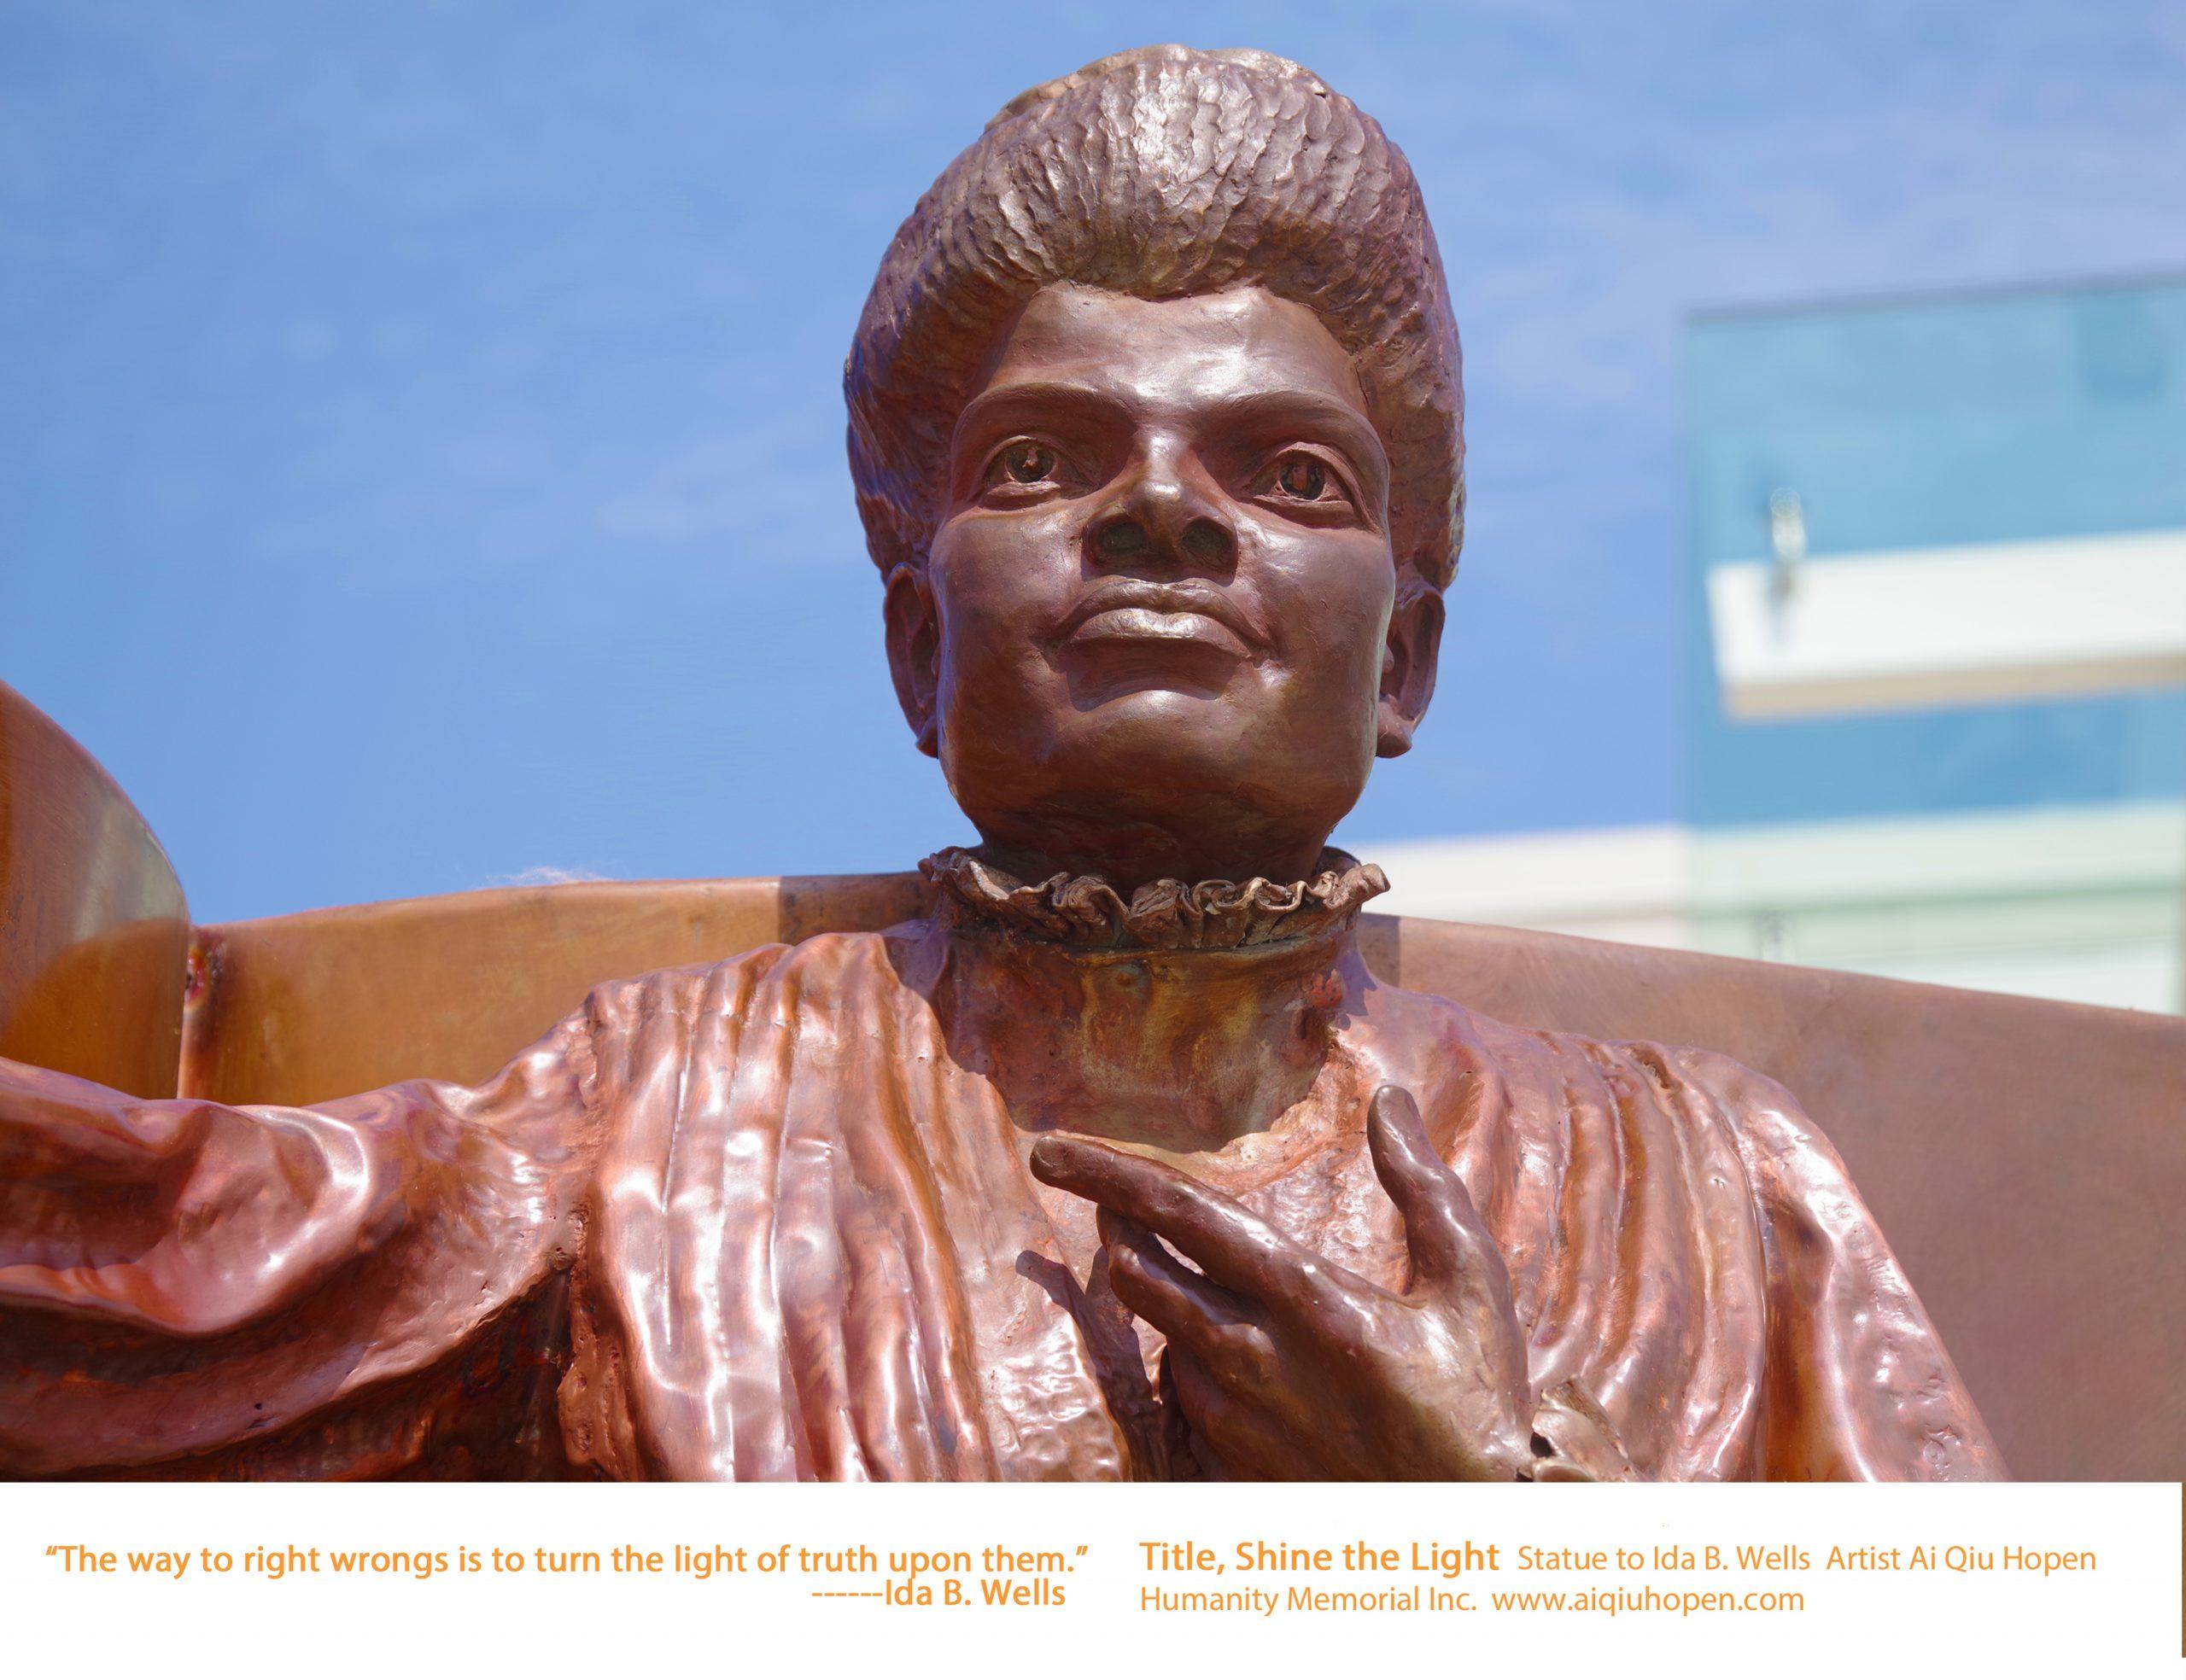 Civil Right Icon Shine the Light Statue to Ida B. Wells, Capital Ida B. Wells Middle School, Washington DC